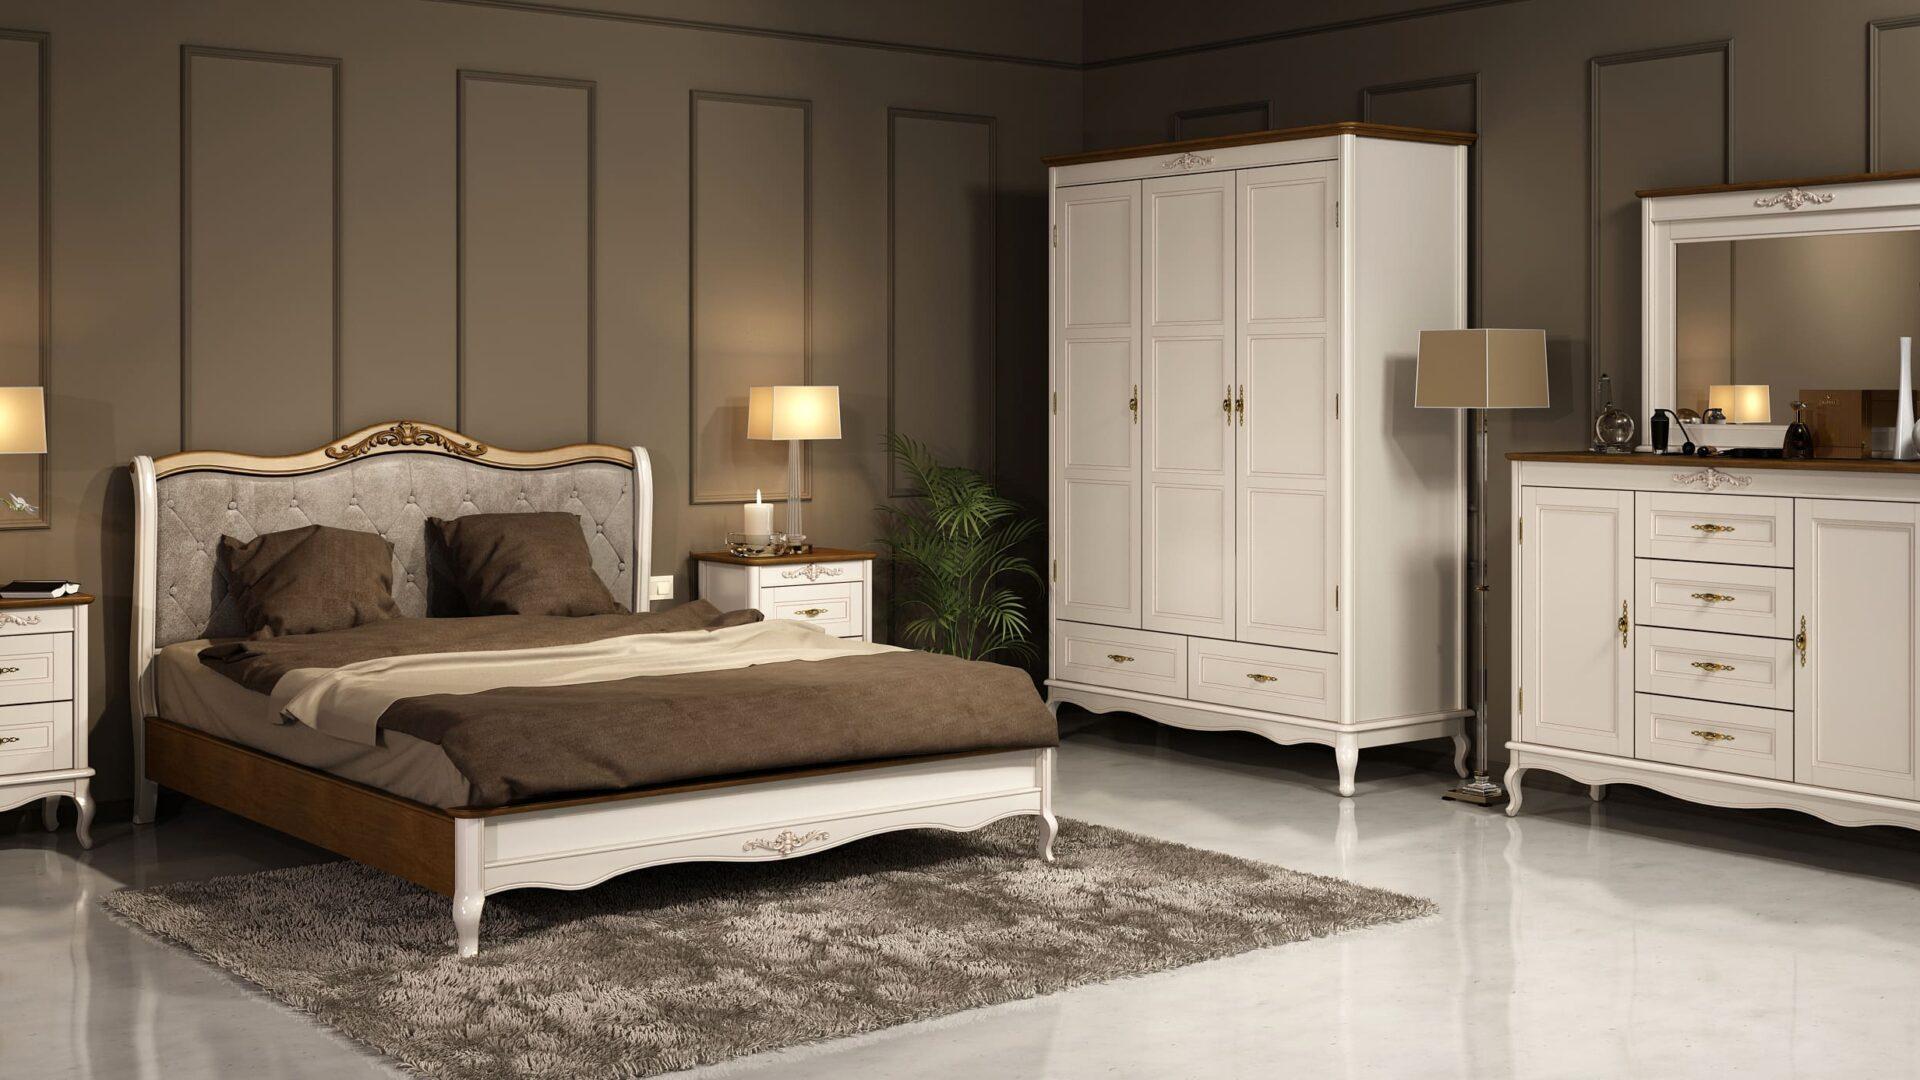 Коллекция мебели для спальни Palermo